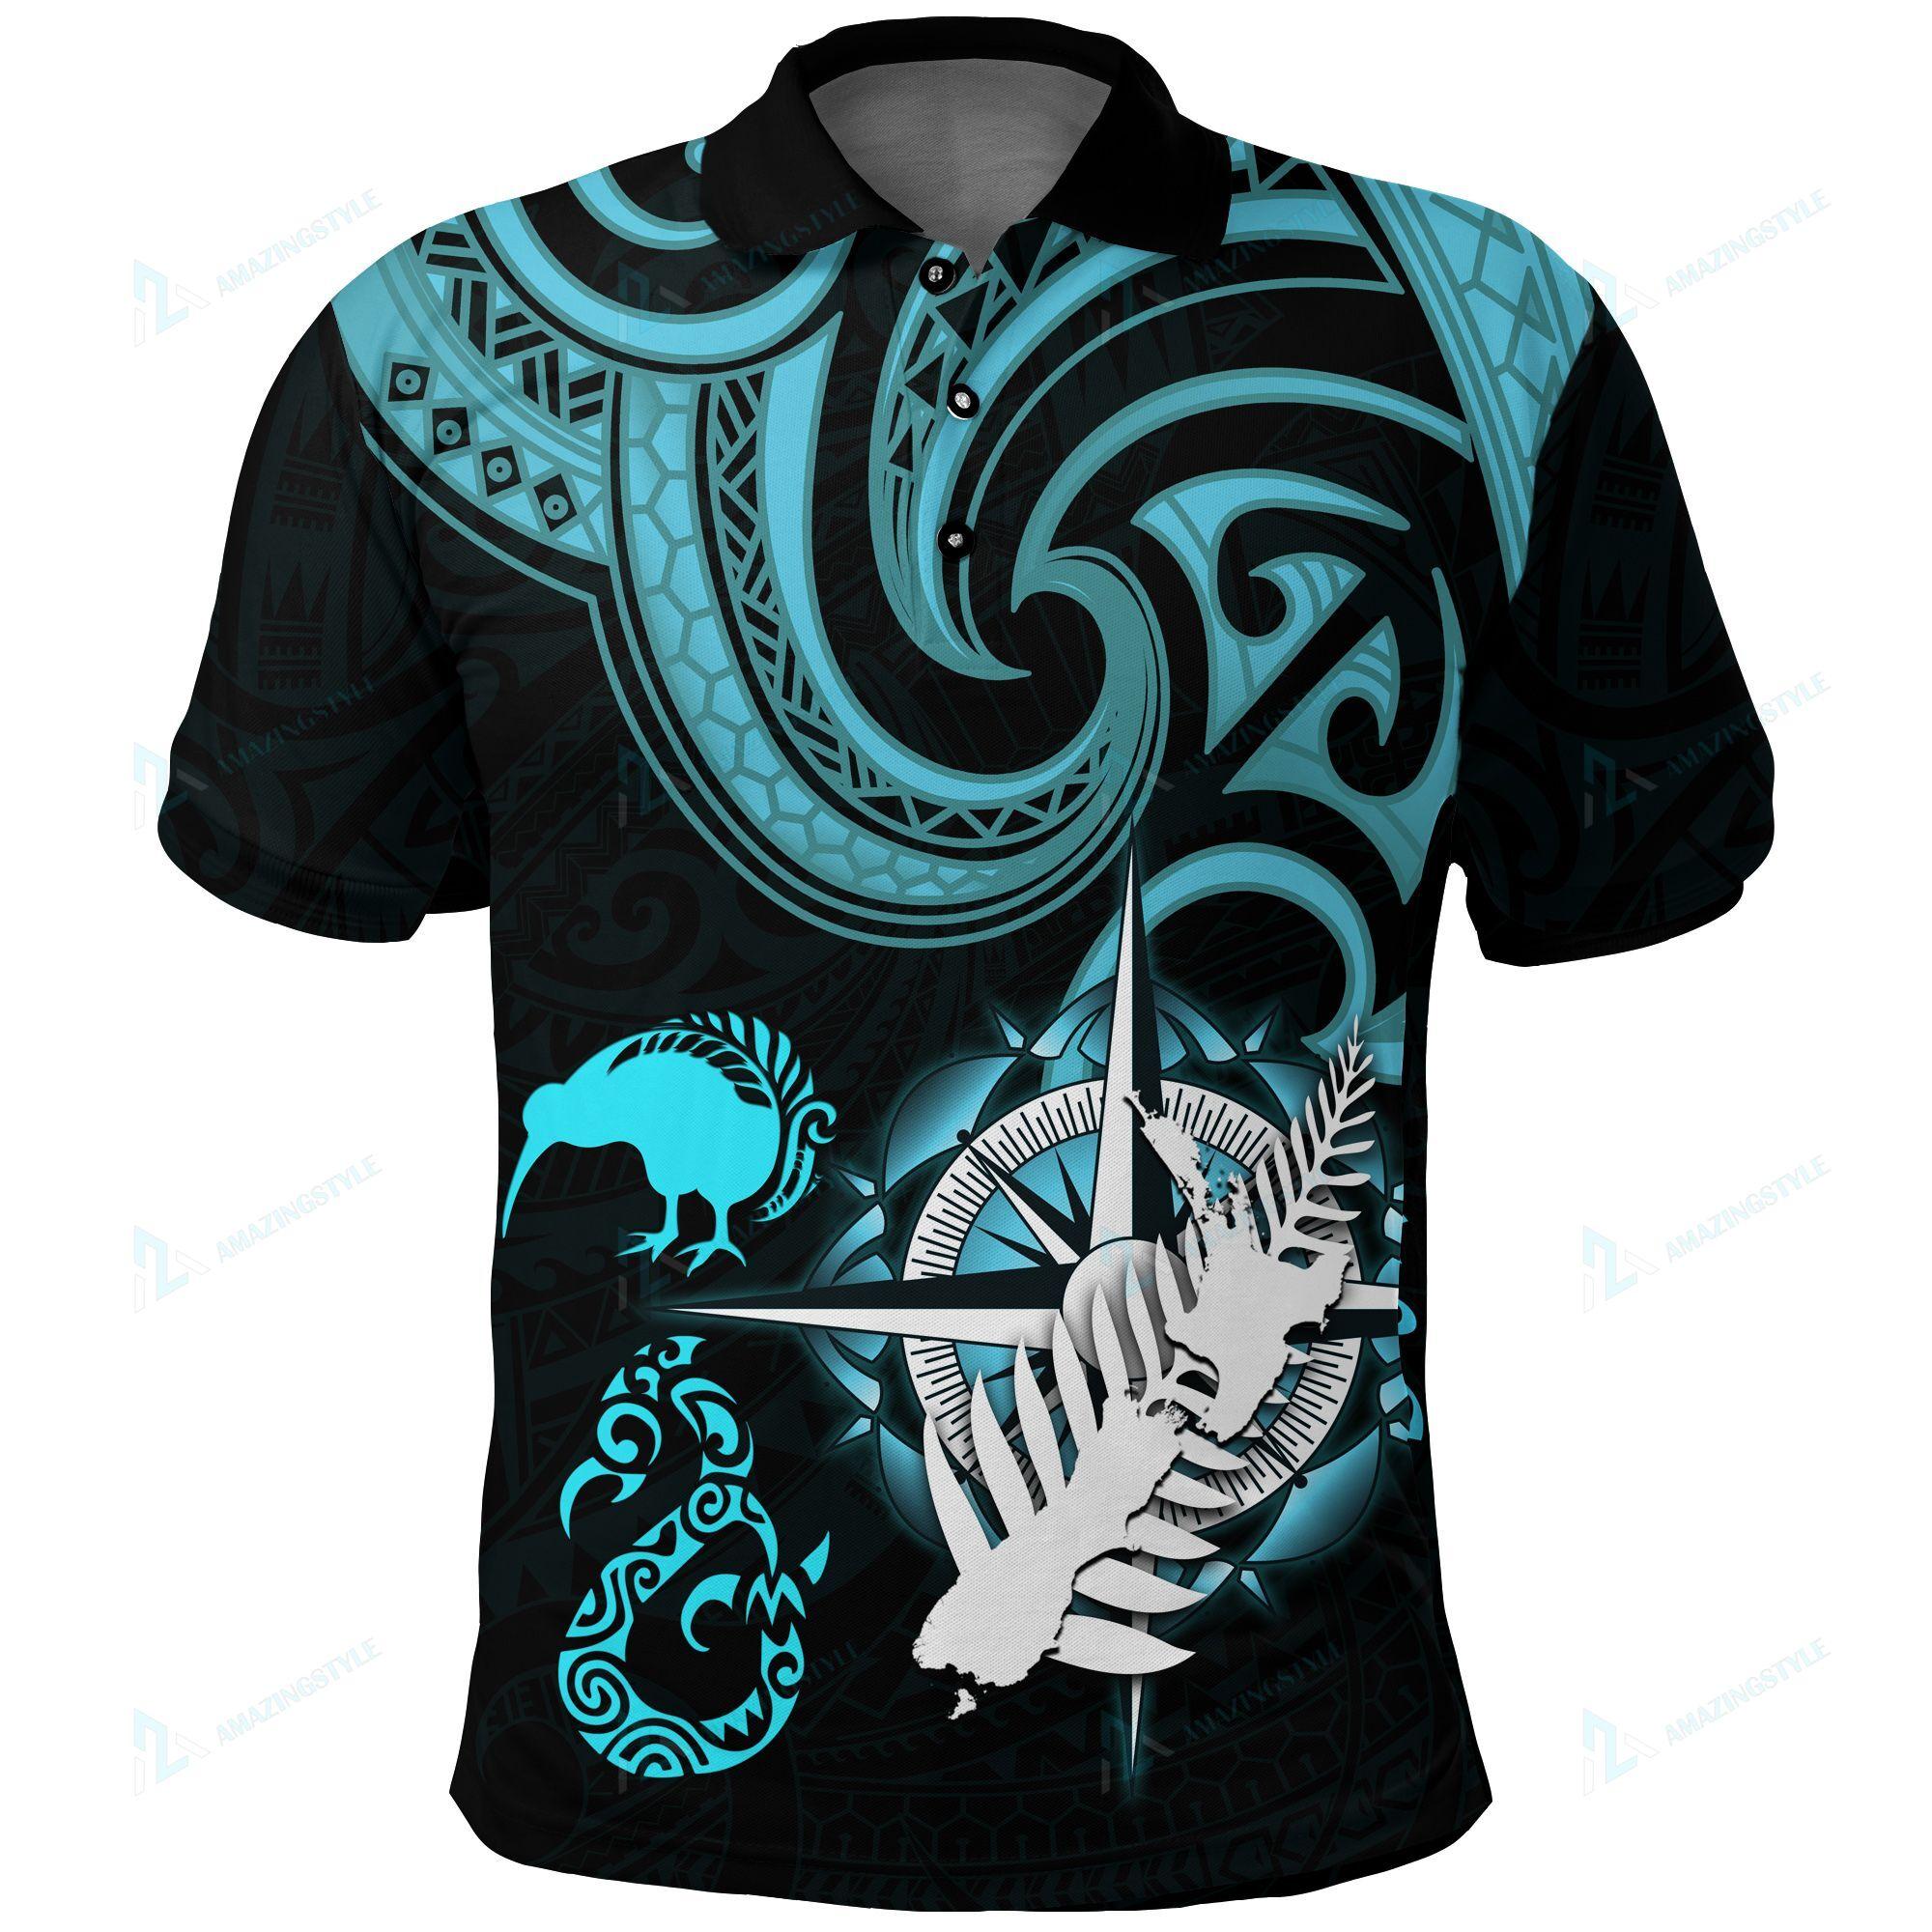 New Zealand Aotearoa Koru Map Compass Manaia Kiwi Shirts